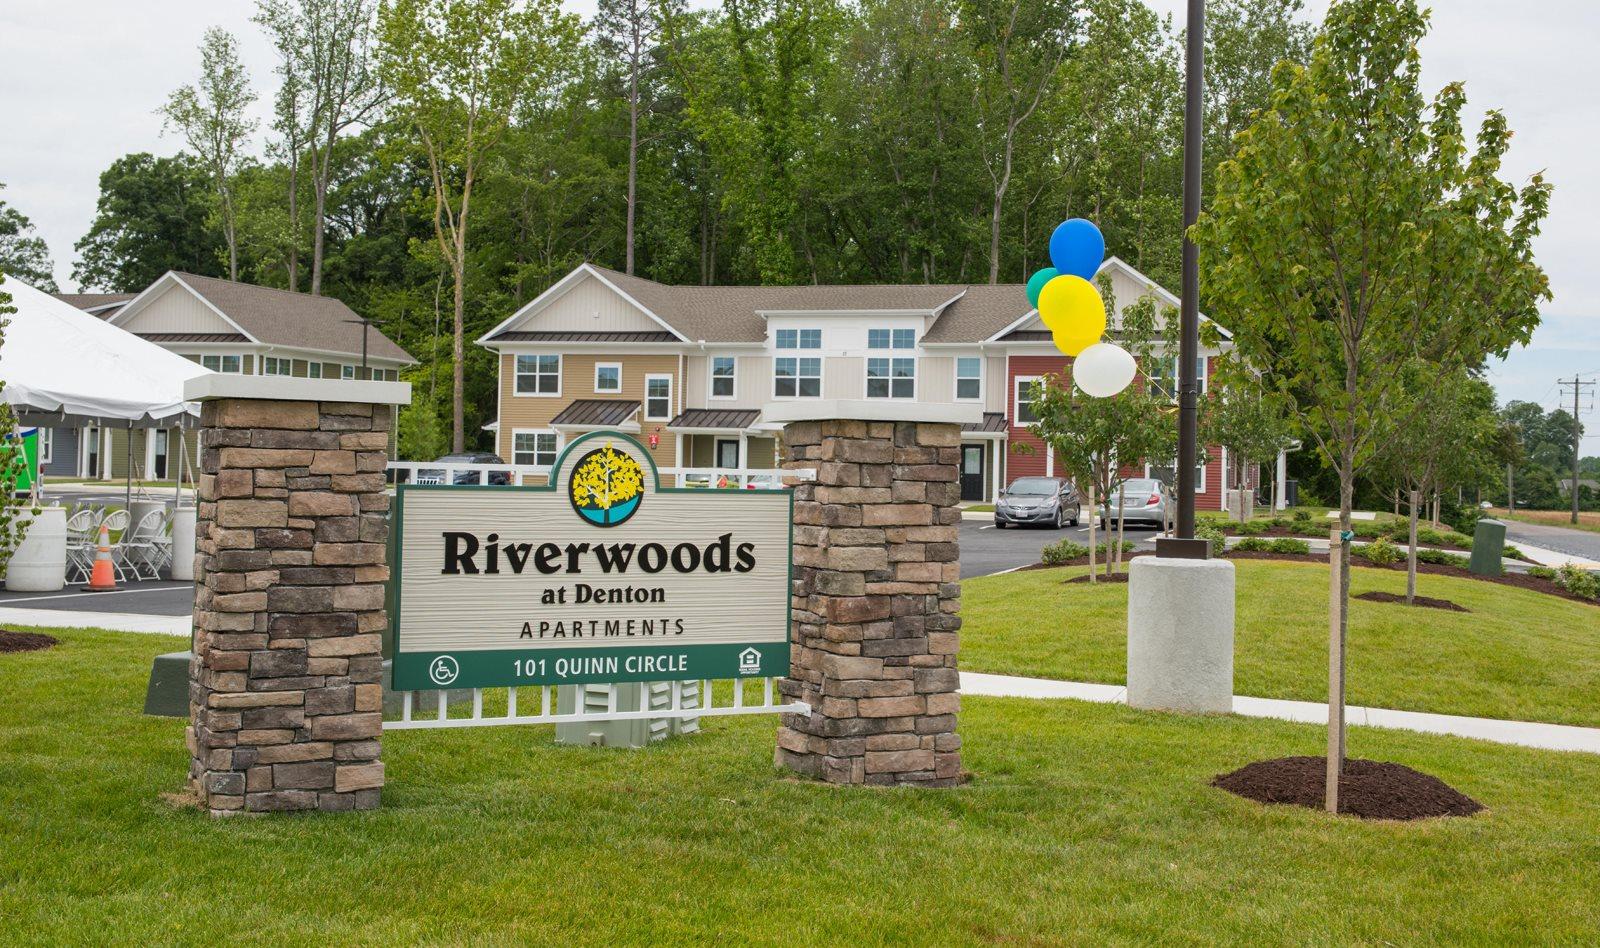 Riverwoods at Denton Apartment Community Entrance